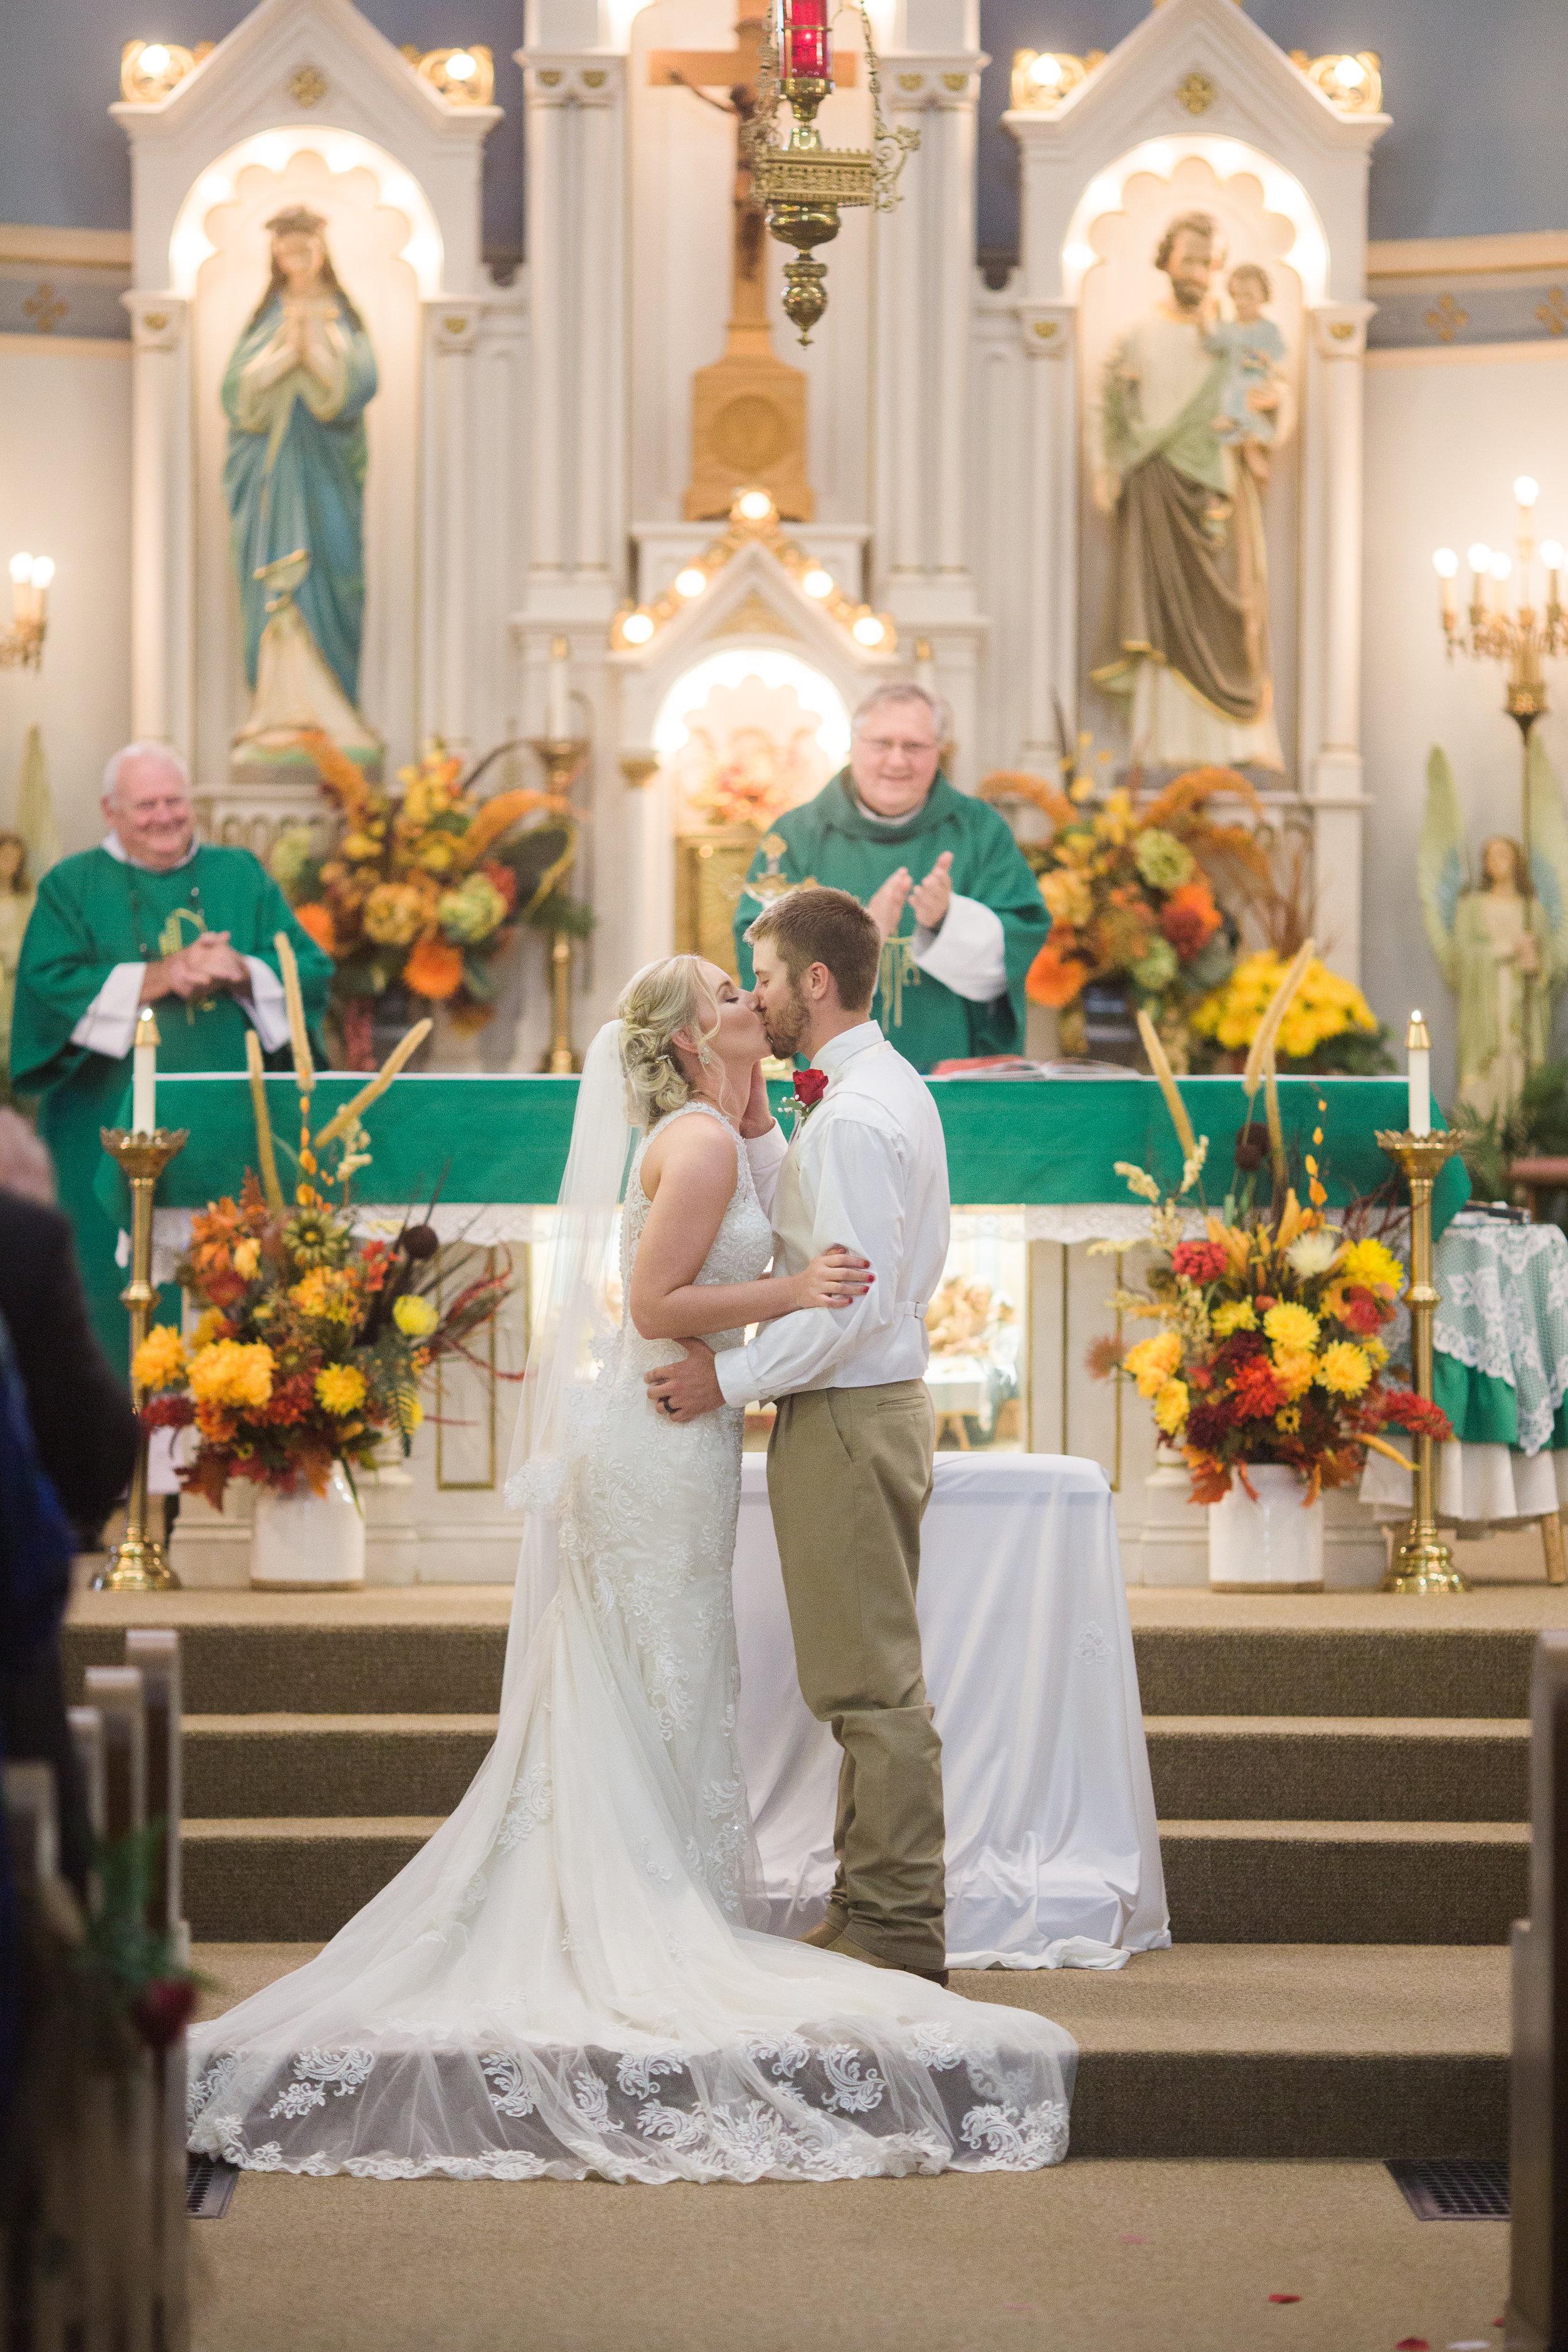 Bailey-Nathan-Windthorst-Texas-Wedding-041.jpg